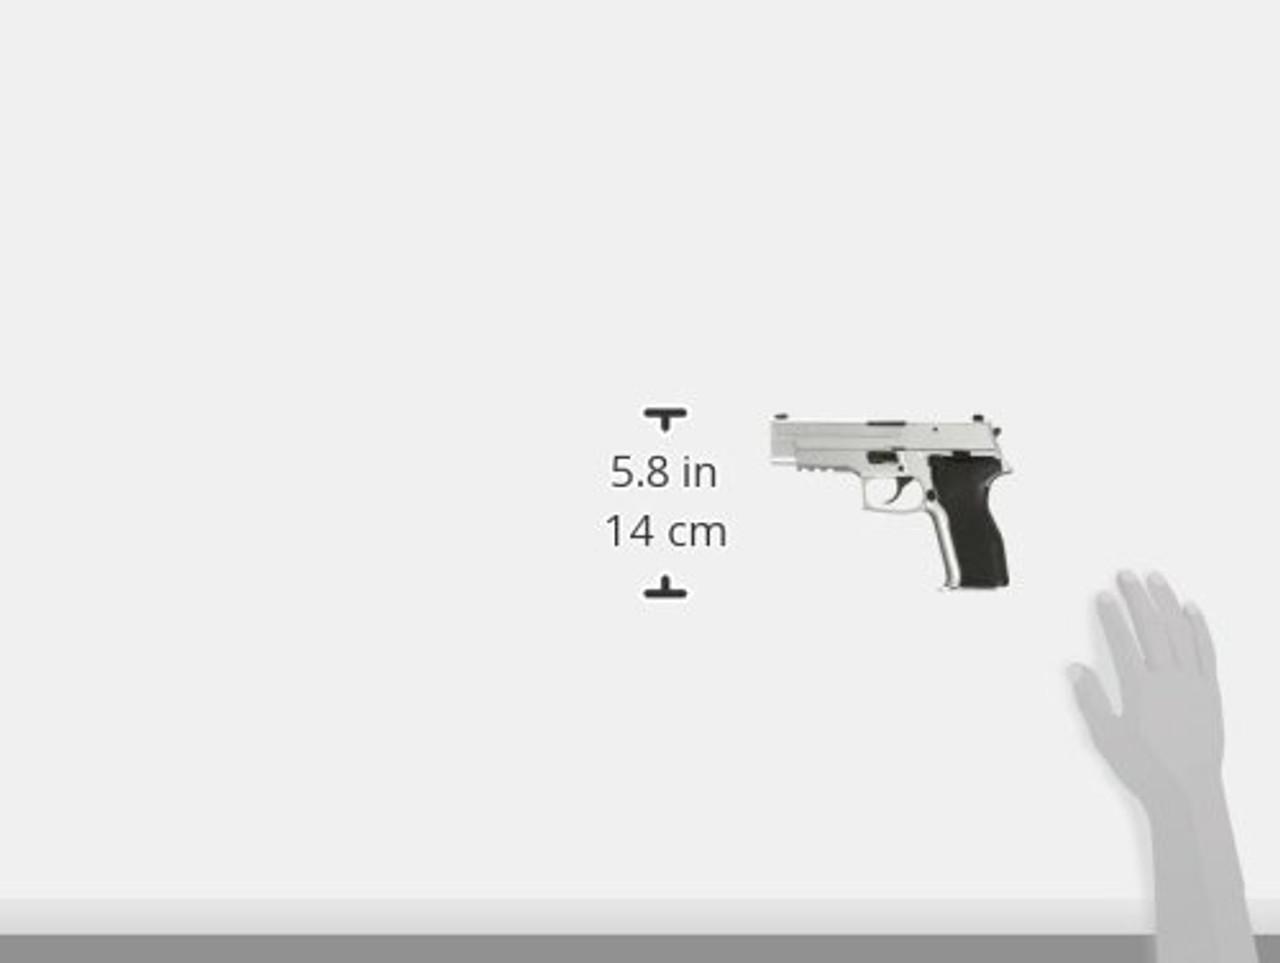 Tokyo Marui SIG SAUER P226 E2 STAINLESS MODEL Gas Blow Back Airsoft Gun Japan